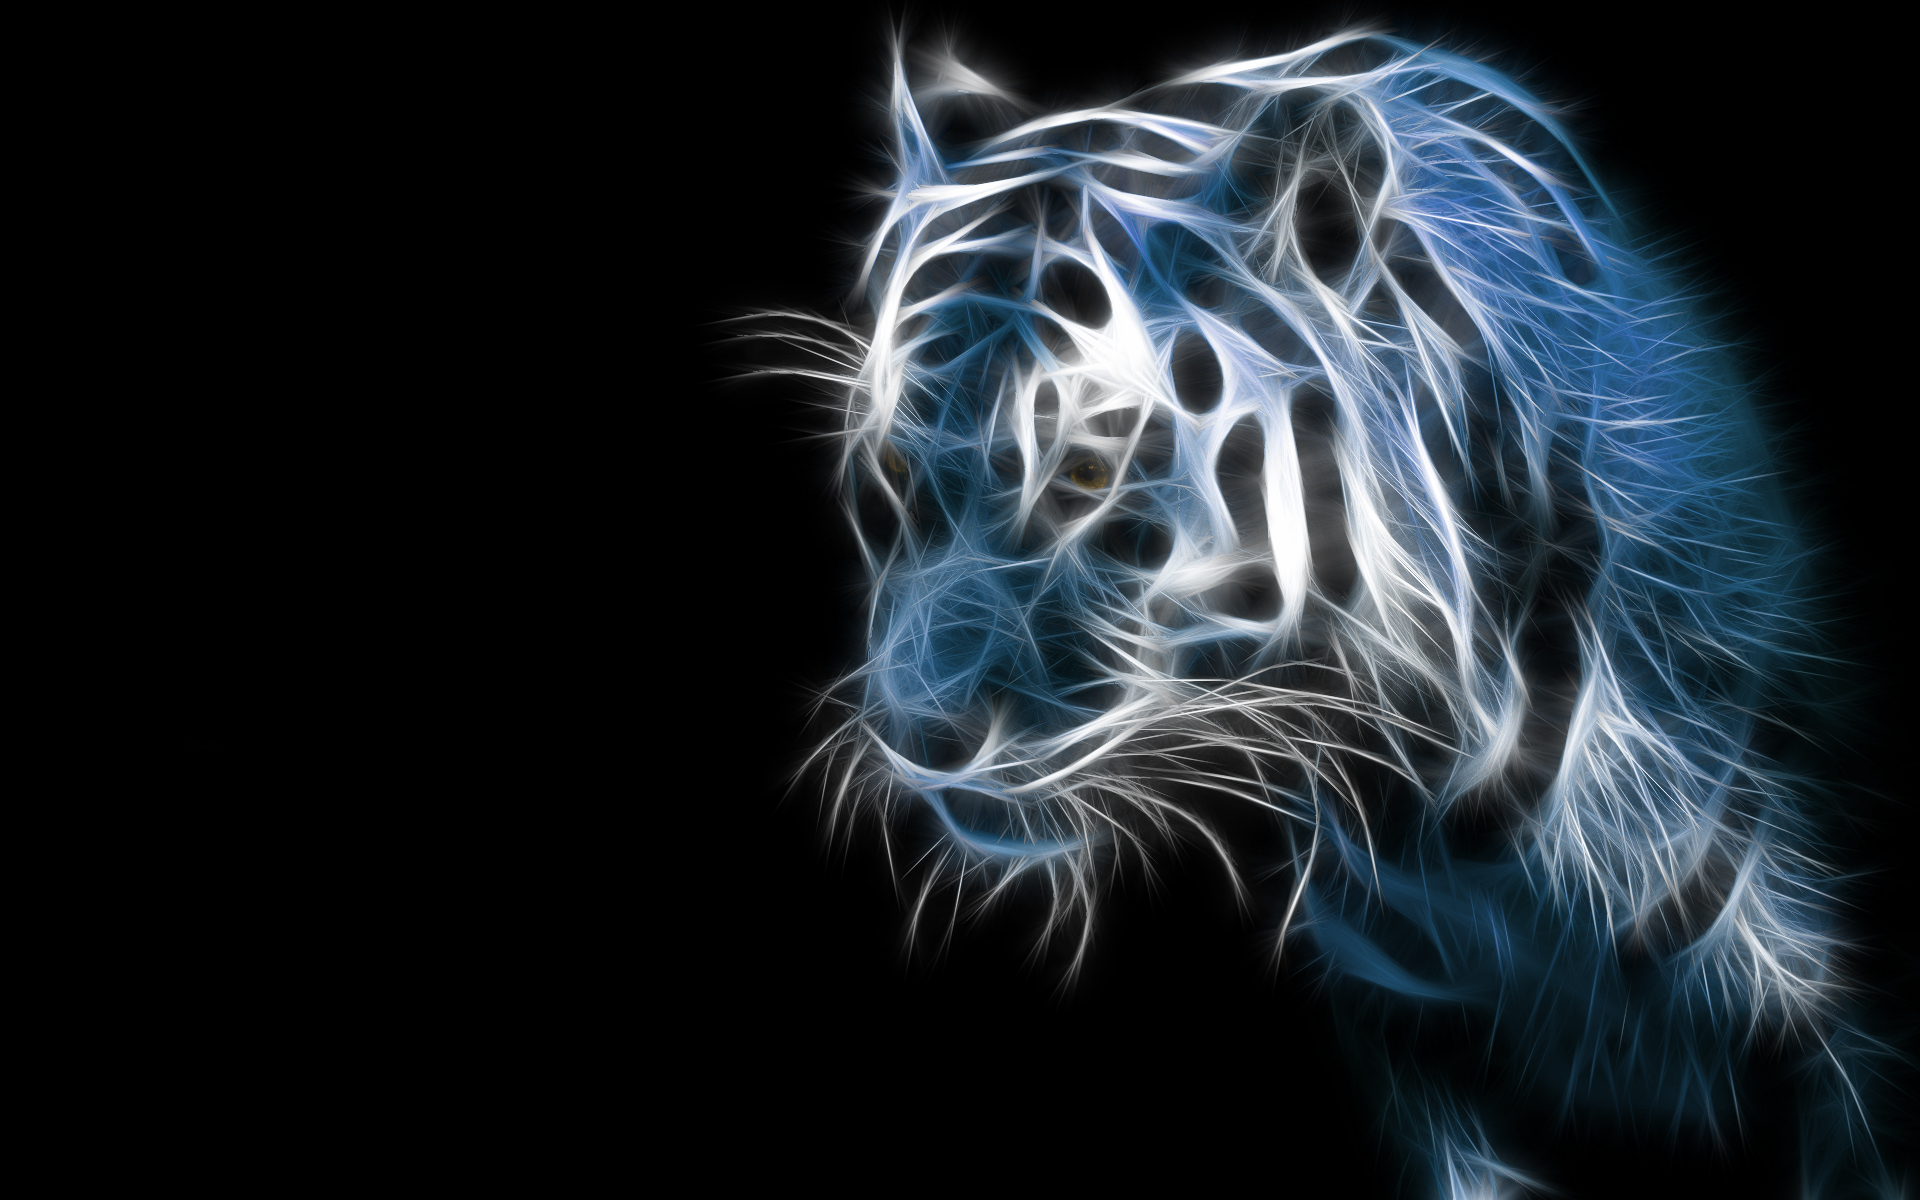 Sketch tiger pictures